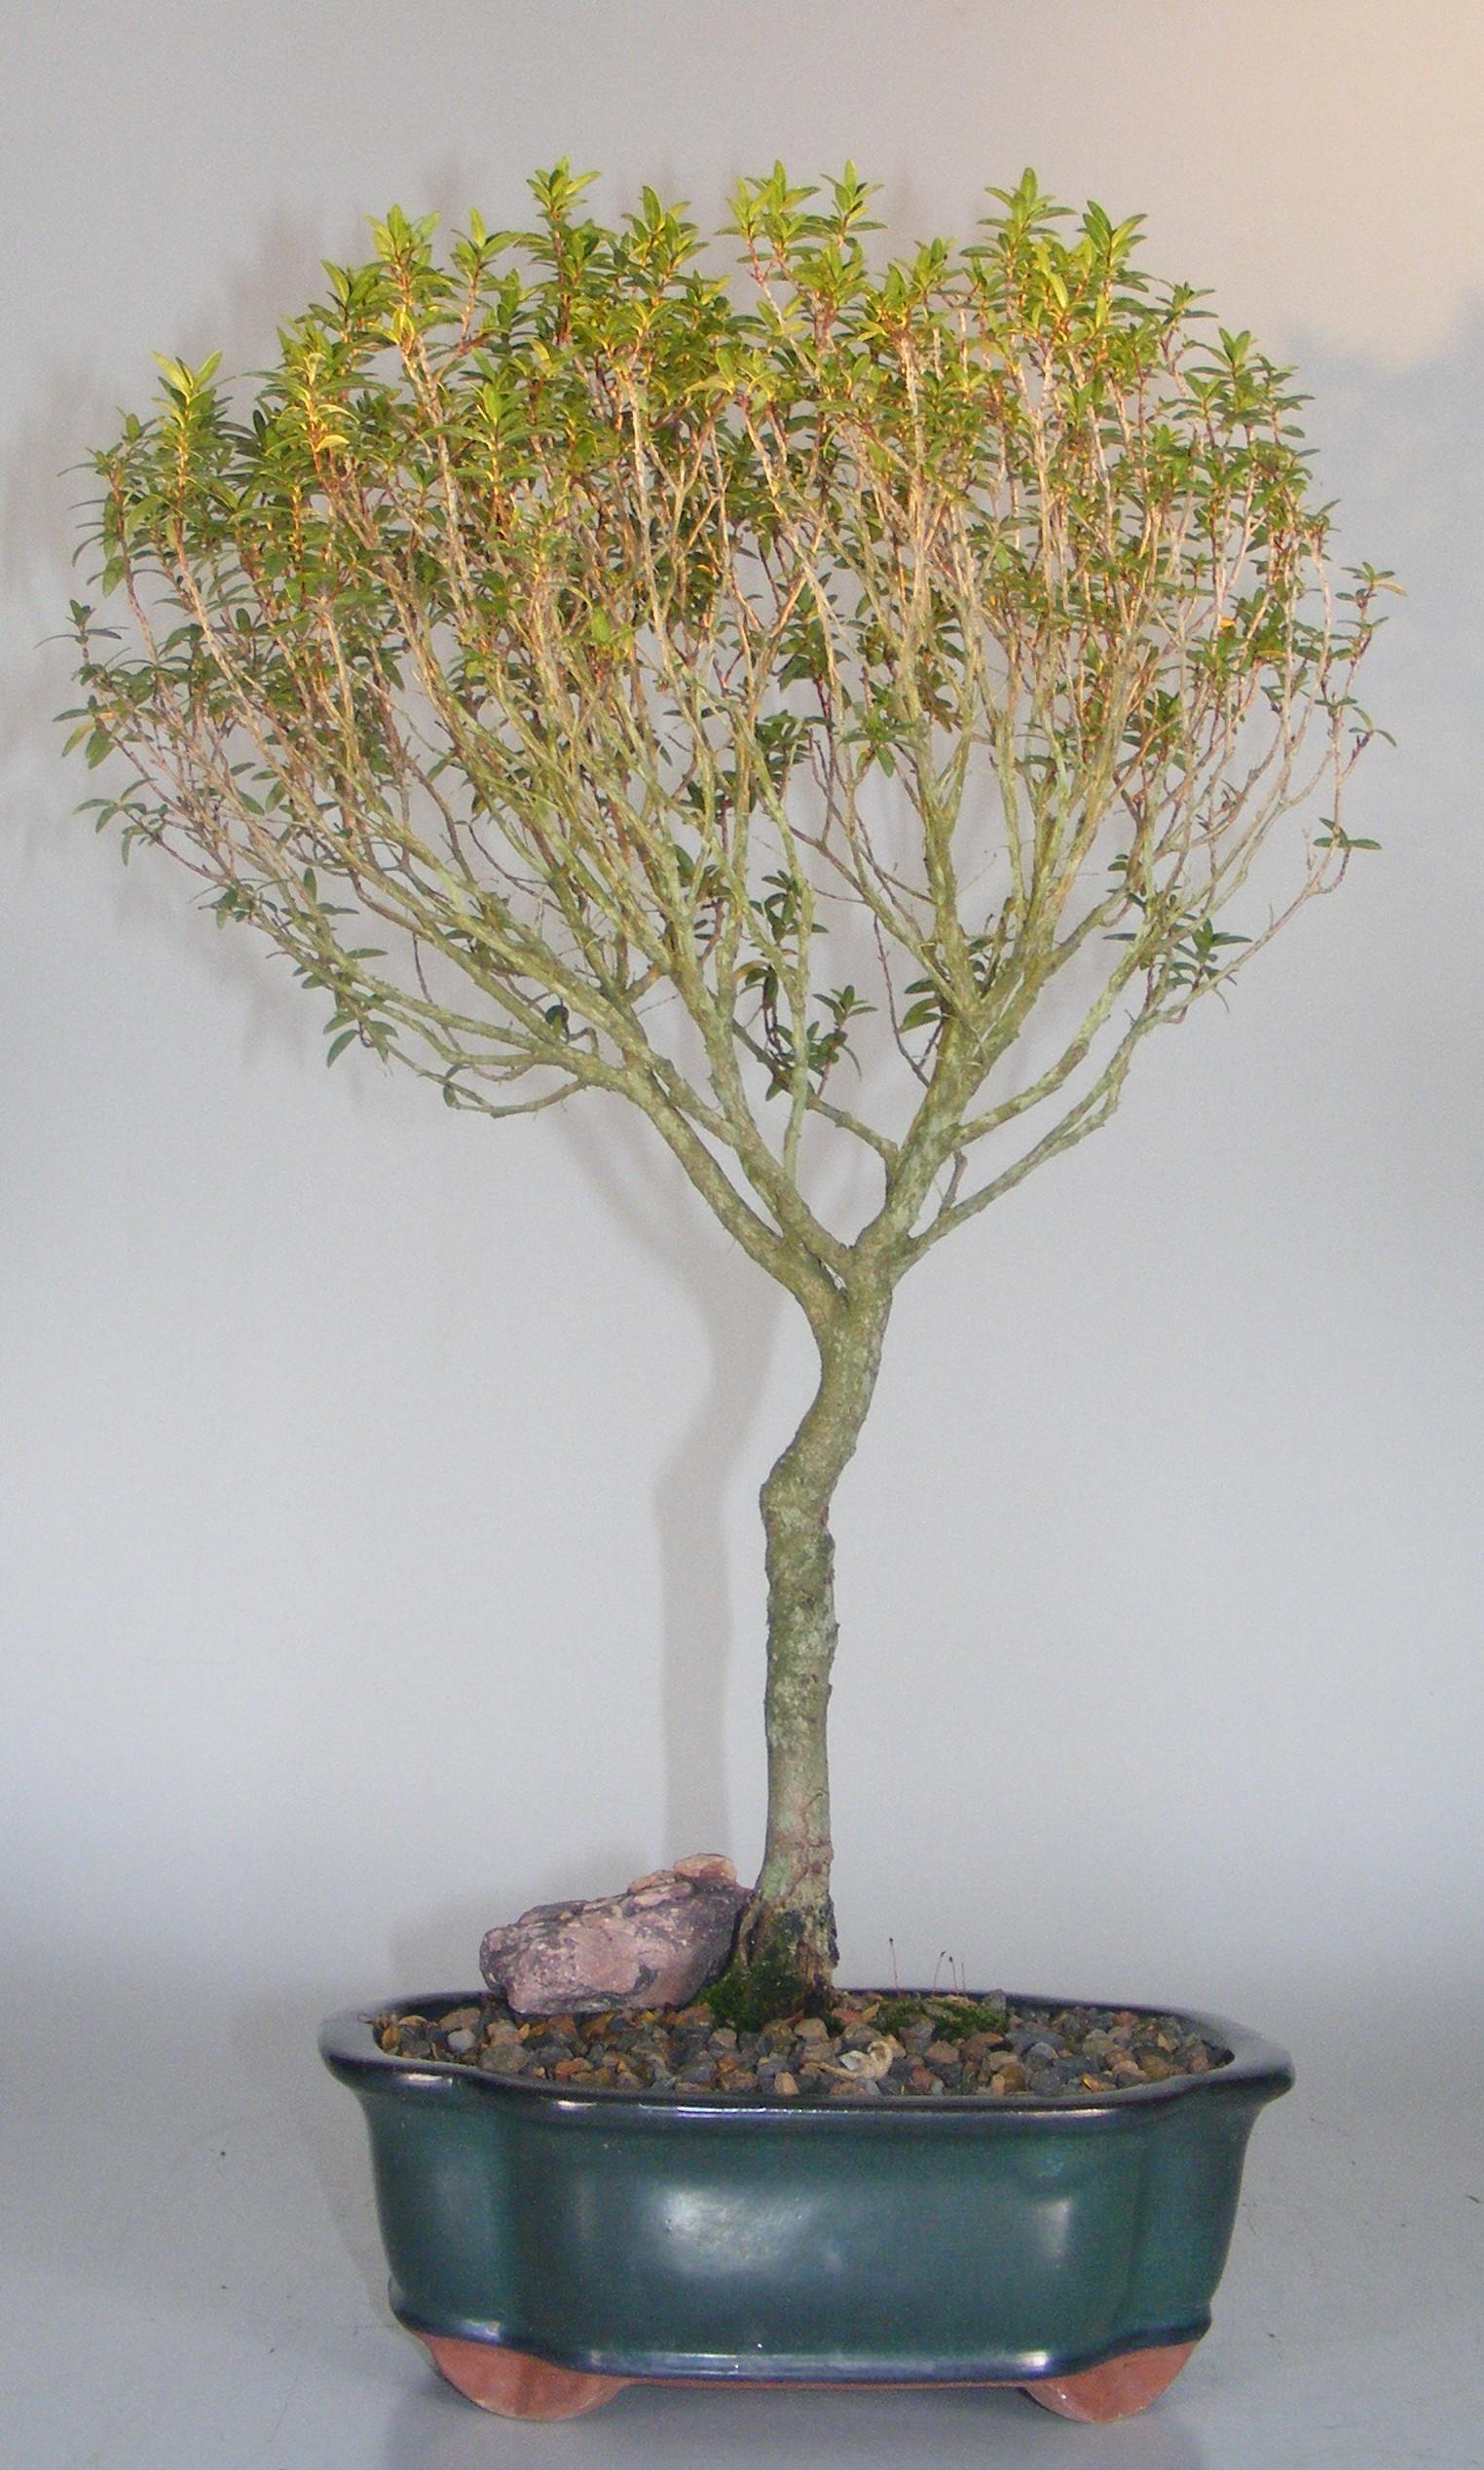 Flowering Myrtle Bonsai Tree(myrtus communis 'compacta') Image